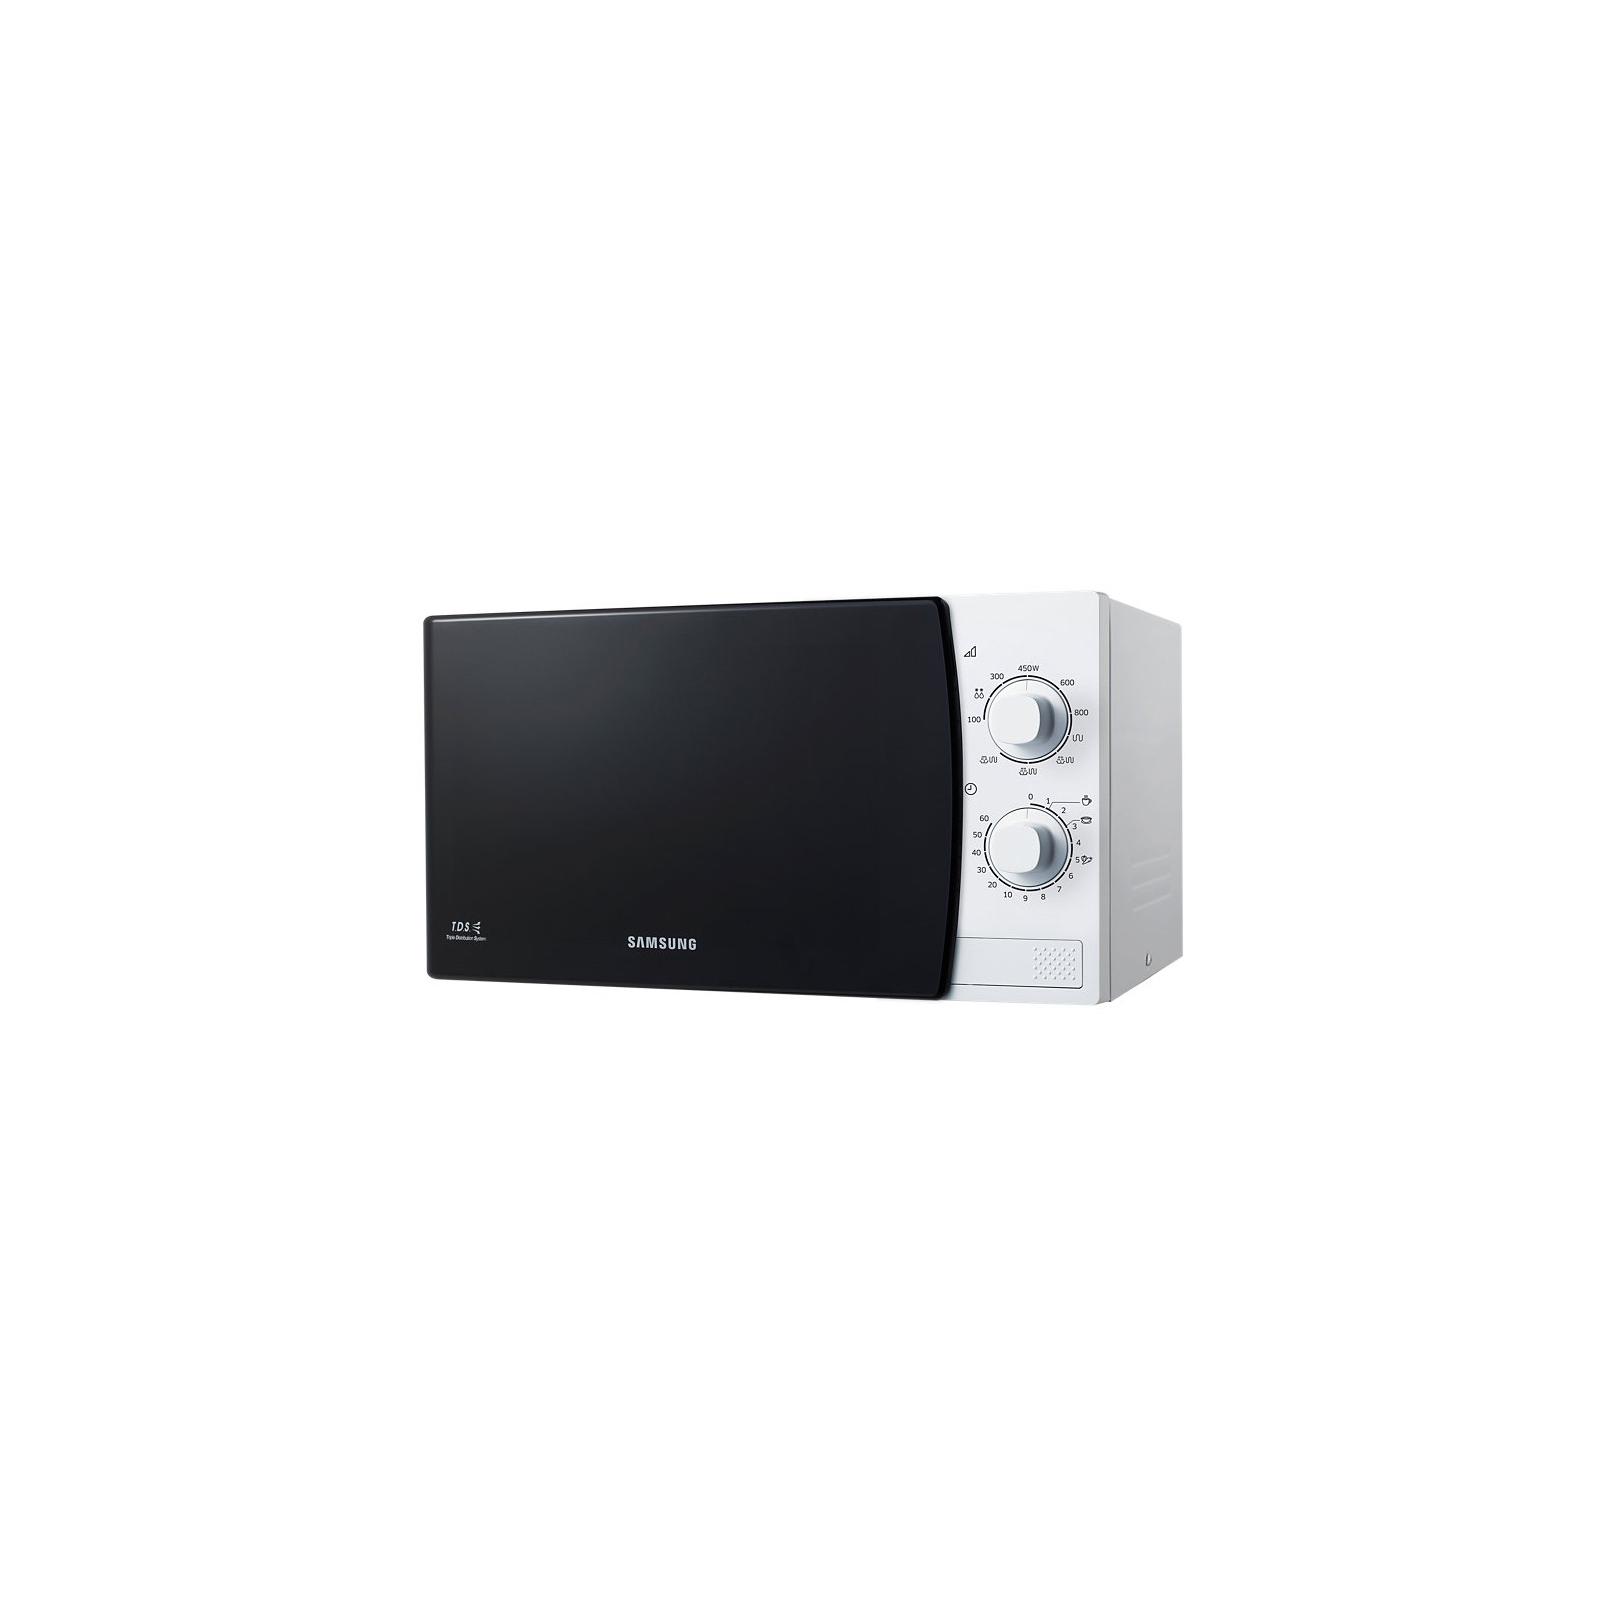 Микроволновая печь Samsung GE 81 KRW-1/BW (GE81KRW-1/BW) изображение 2